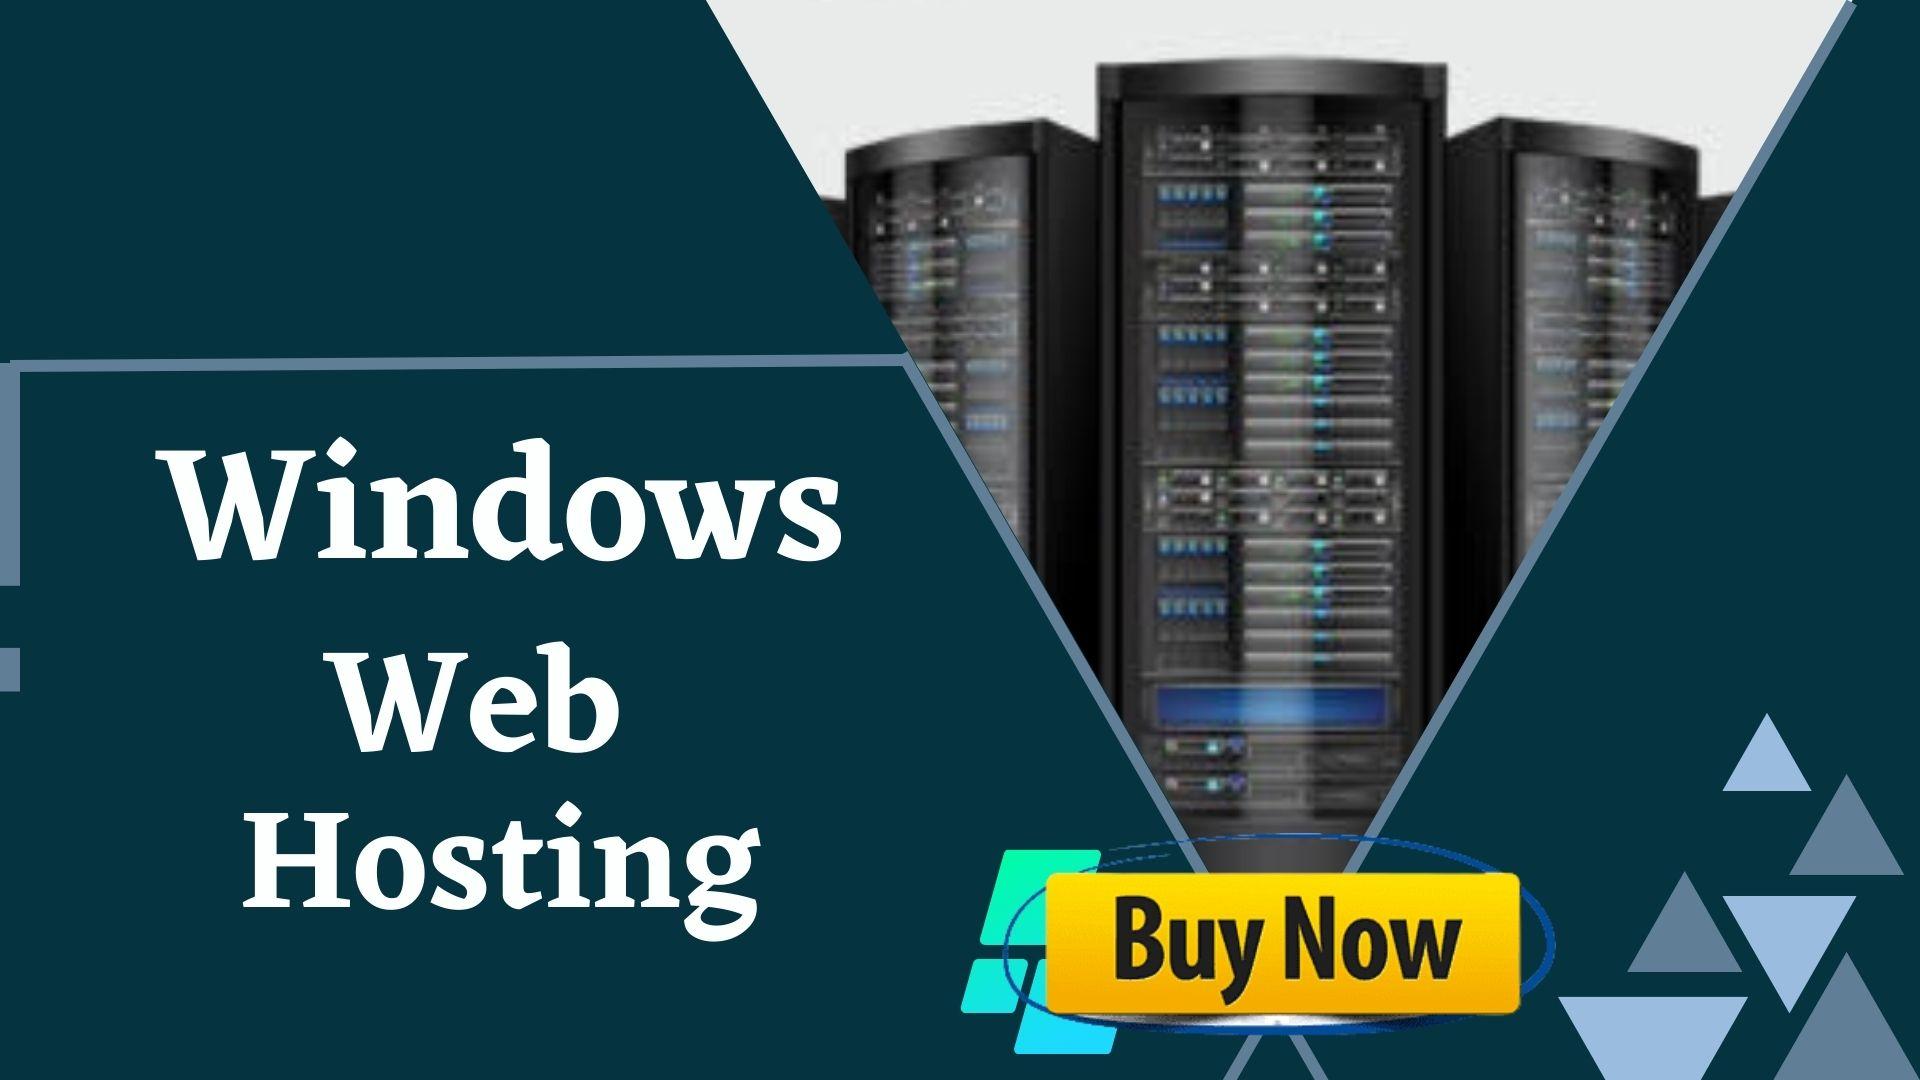 USA Windows Web Hosting